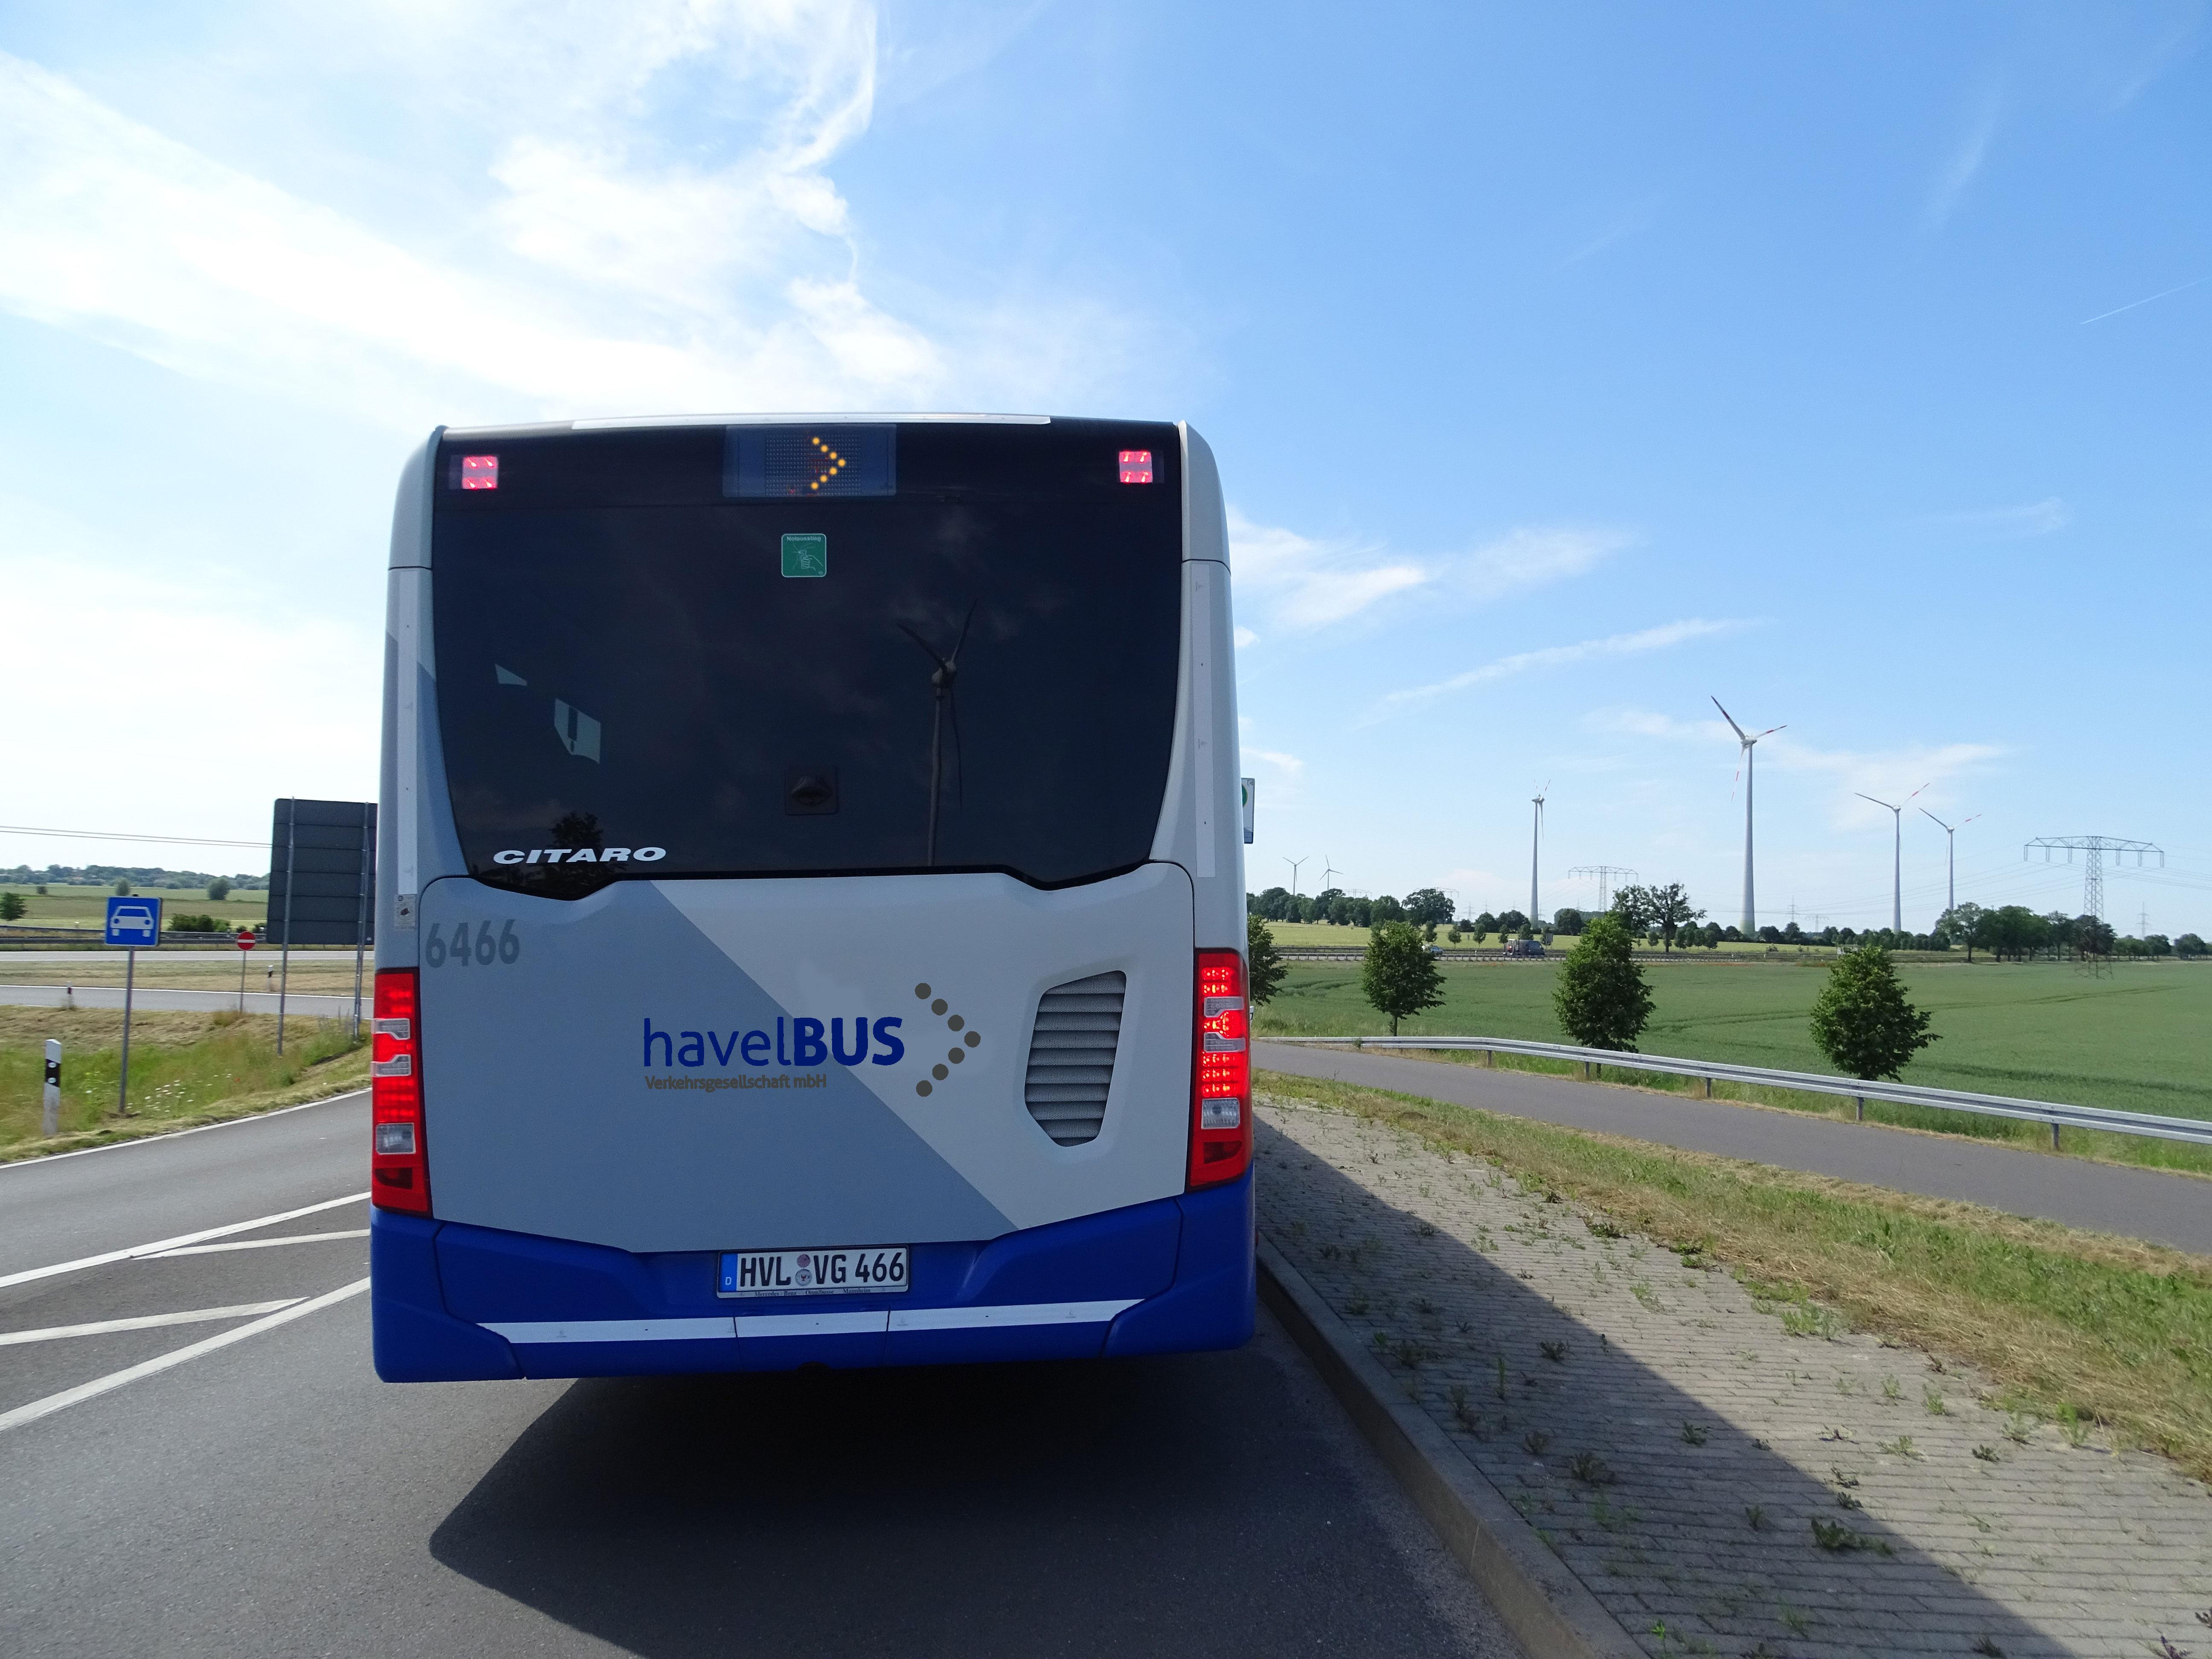 Fahrplanänderungen der Havelbus Verkehrsgesellschaft mbH ab 4. September 2017